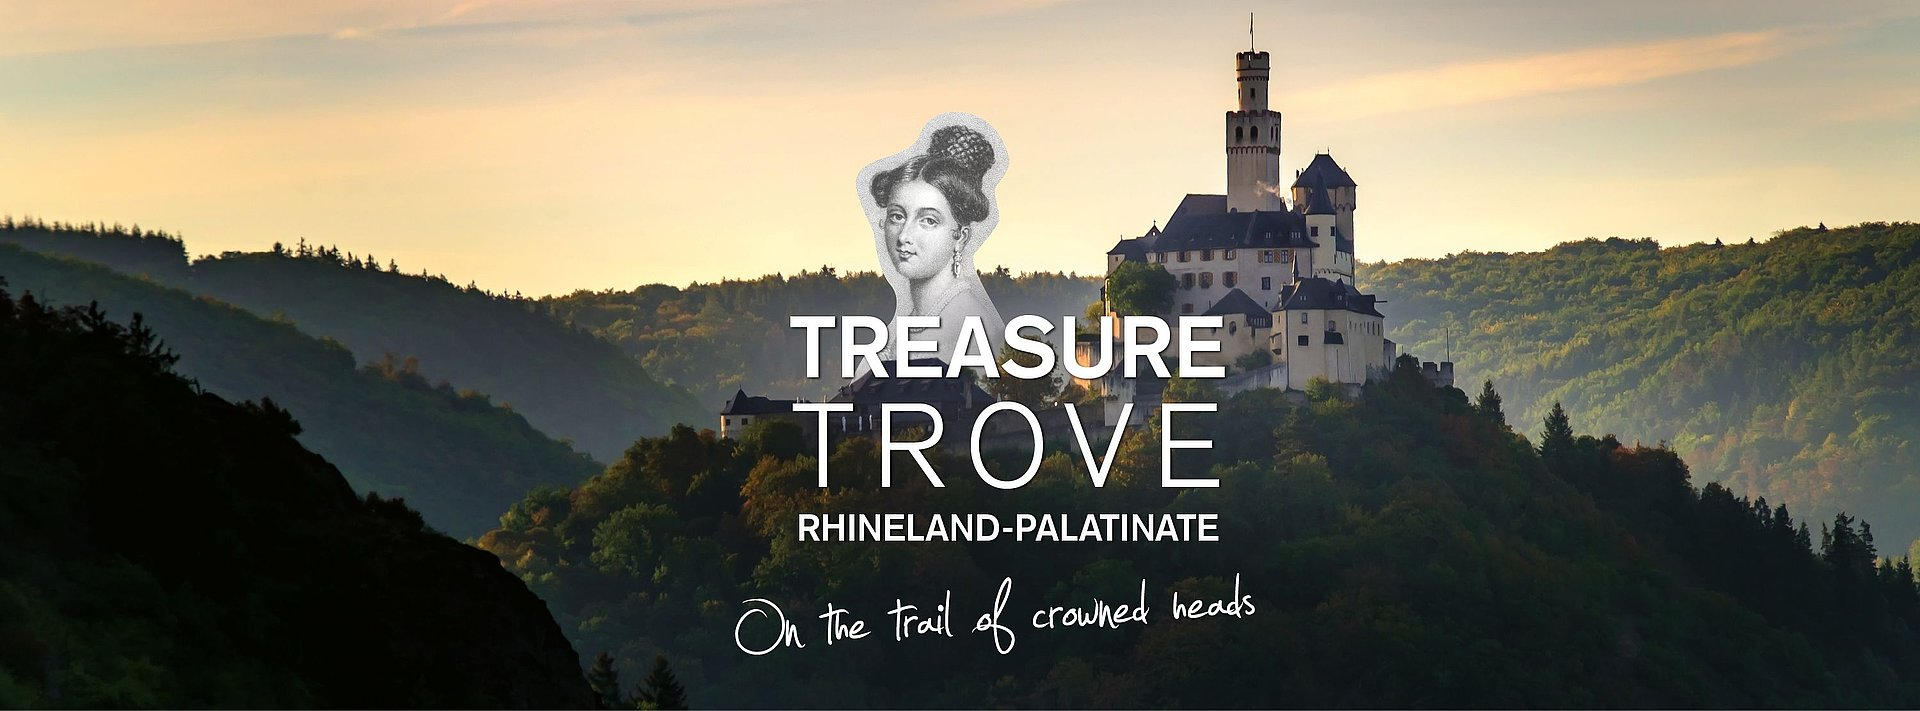 Treasure trove Rhineland-Palatinate